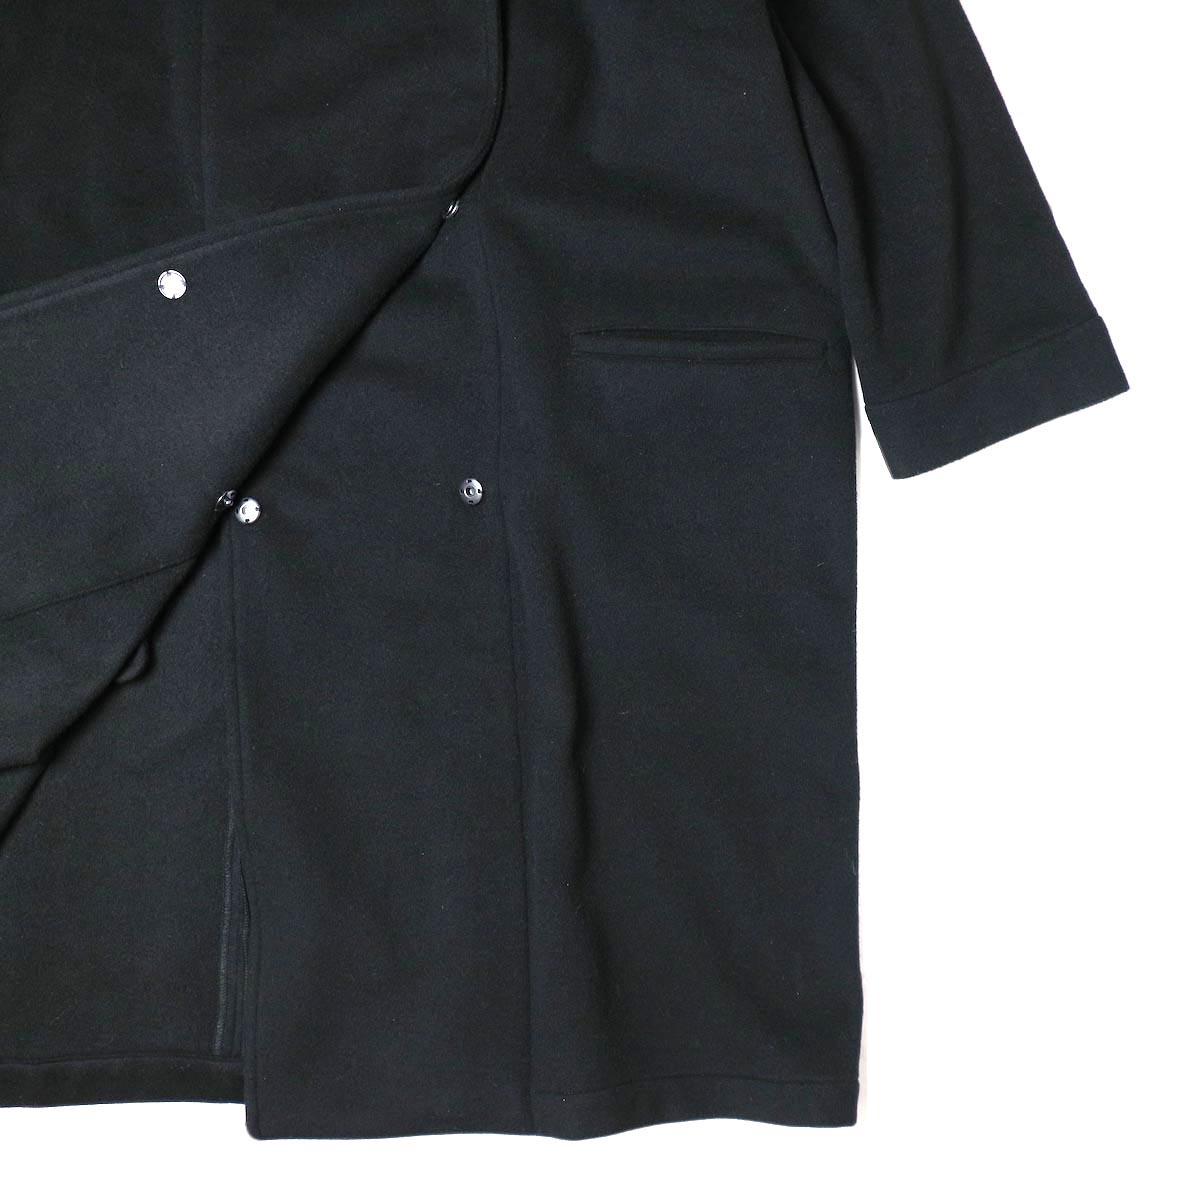 Honnete / Shawl Collar Wide Coat (Black) ポケット・裾